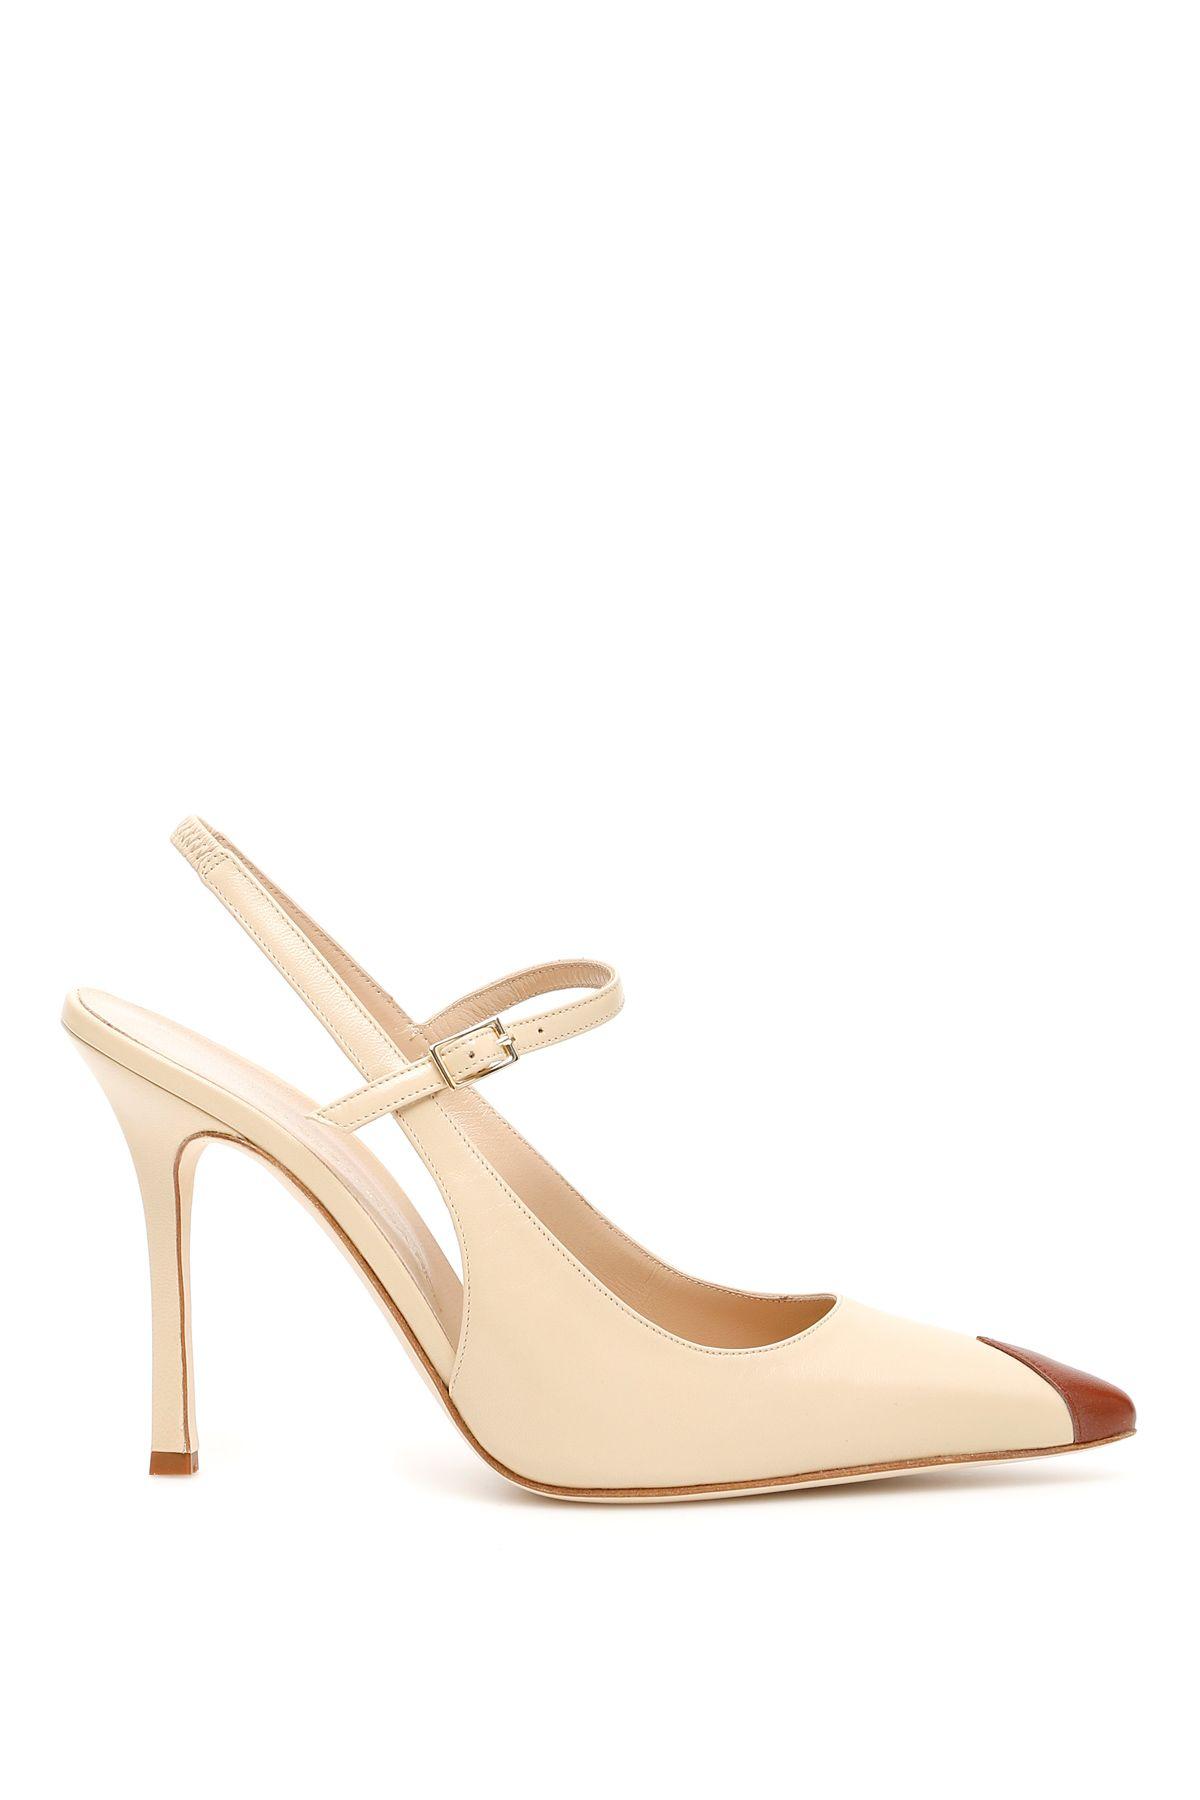 Alessandra Rich Shoes BICOLOR SLINGBACKS